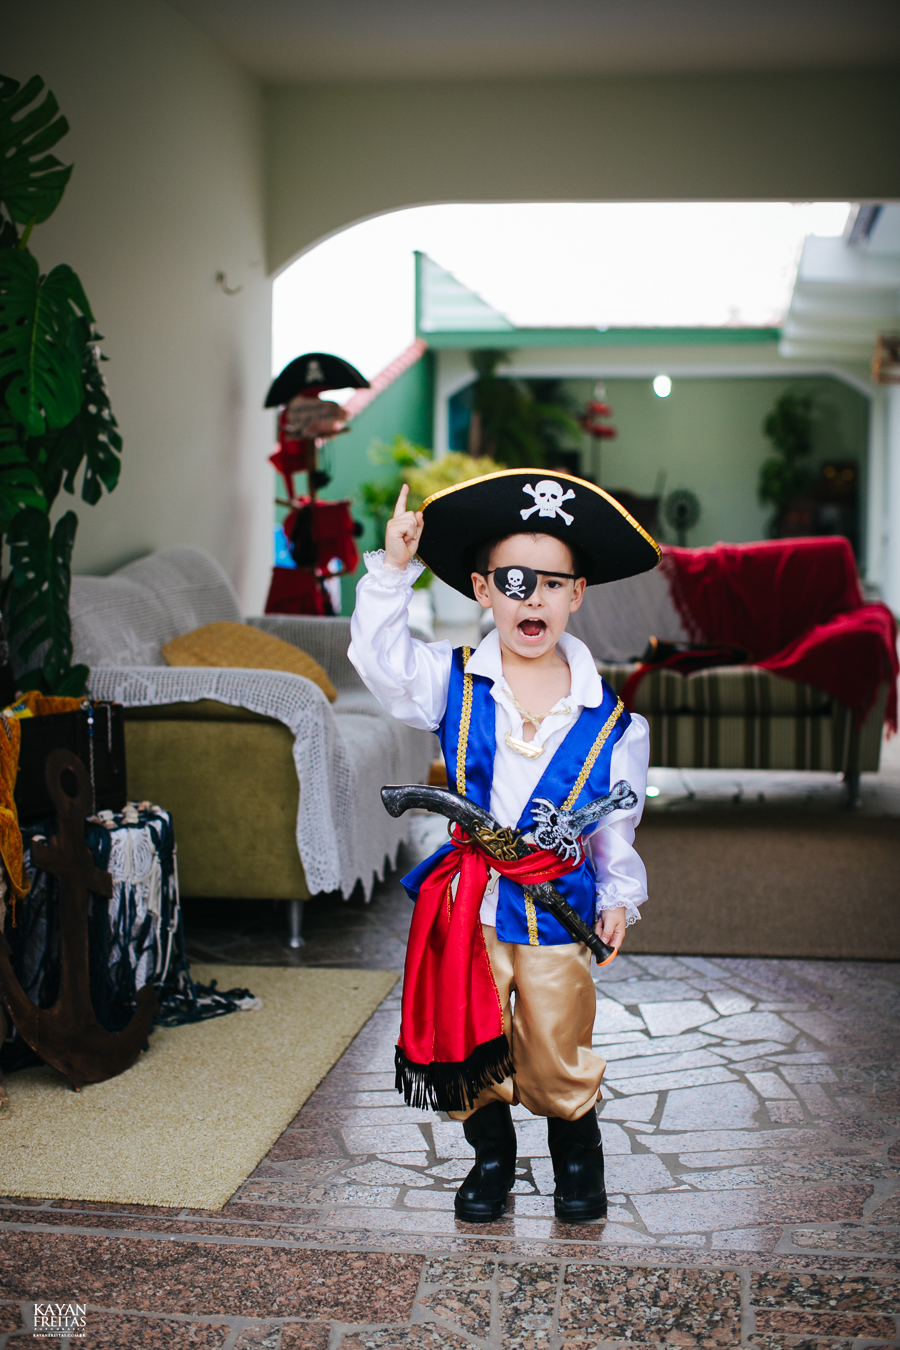 henrique-6anos-0033 Henrique - Aniversário de 6 anos - Santo Amaro da Imperatriz